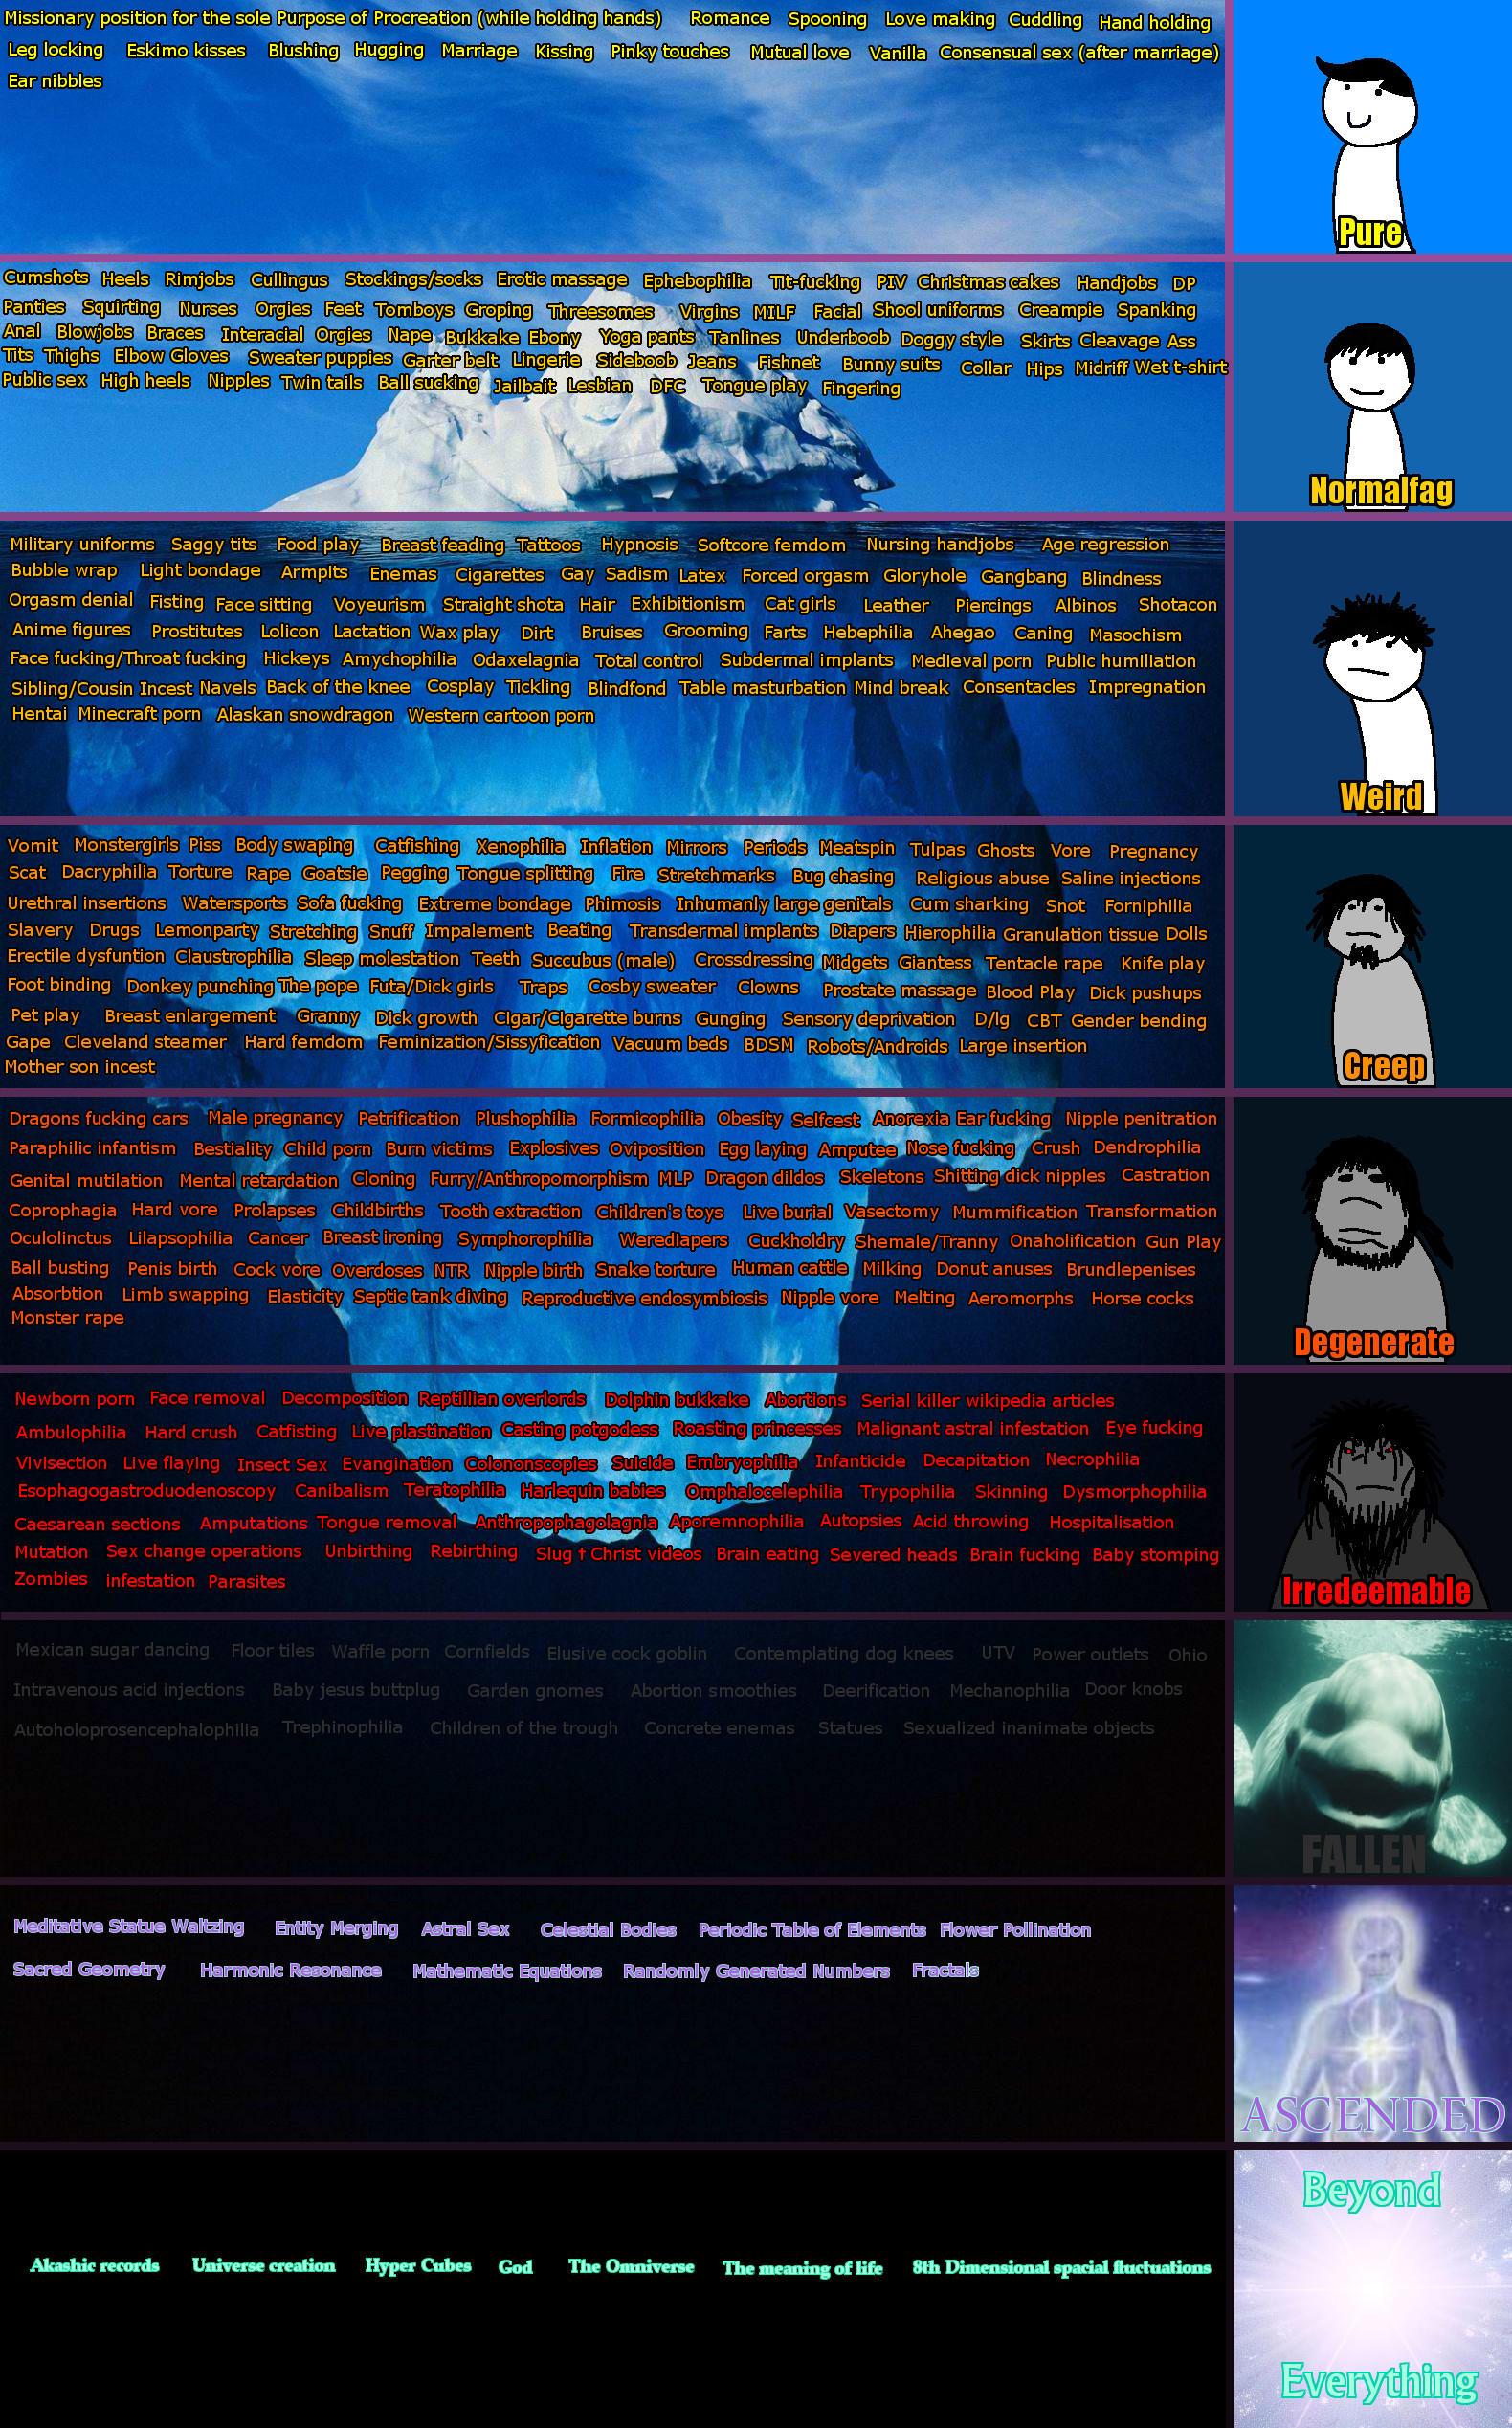 /r9k/'s fetish tiers | Iceberg Tiers Parodies | Know Your Meme